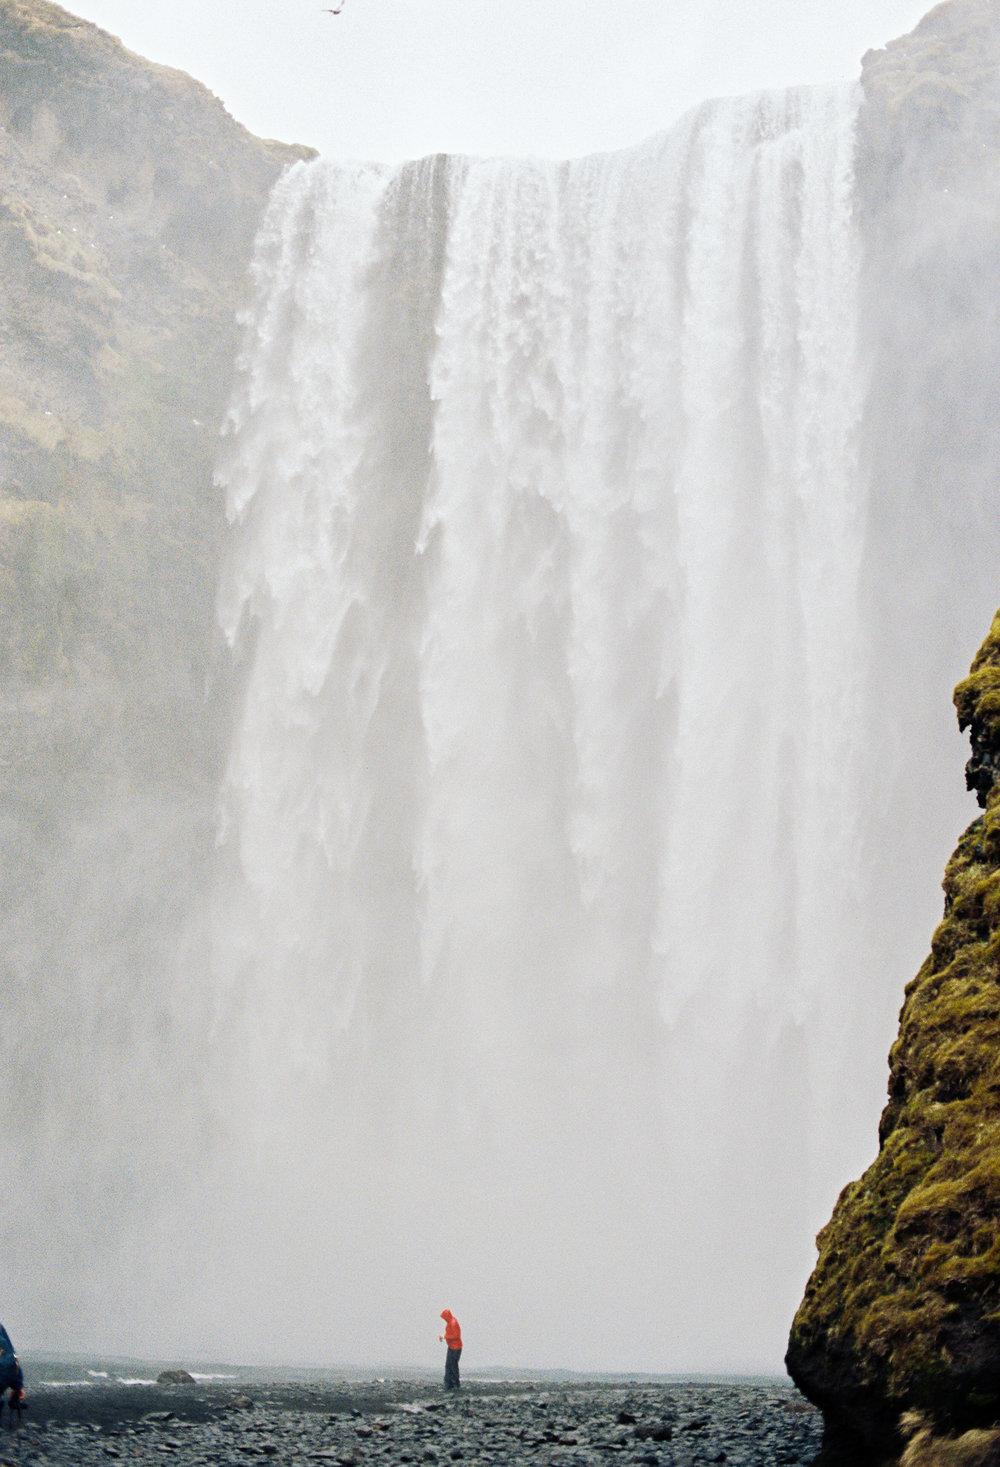 iceland skogafoss tourist waterfall kodak film.jpg